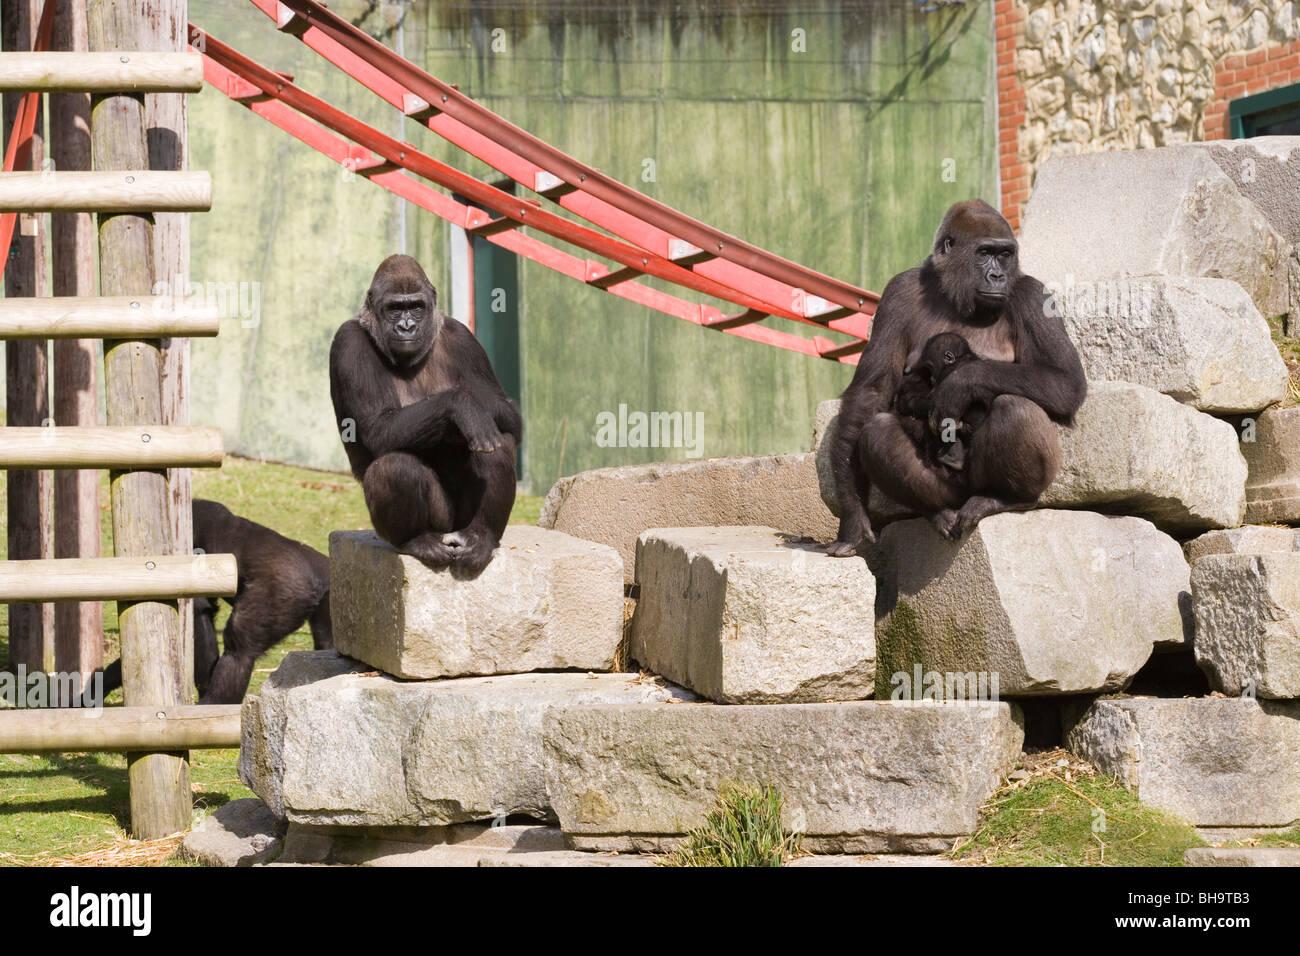 Western Gorillas (Gorilla gorilla). Zoo animals midst 'furniture' objects of 'environmental enrichment'. - Stock Image